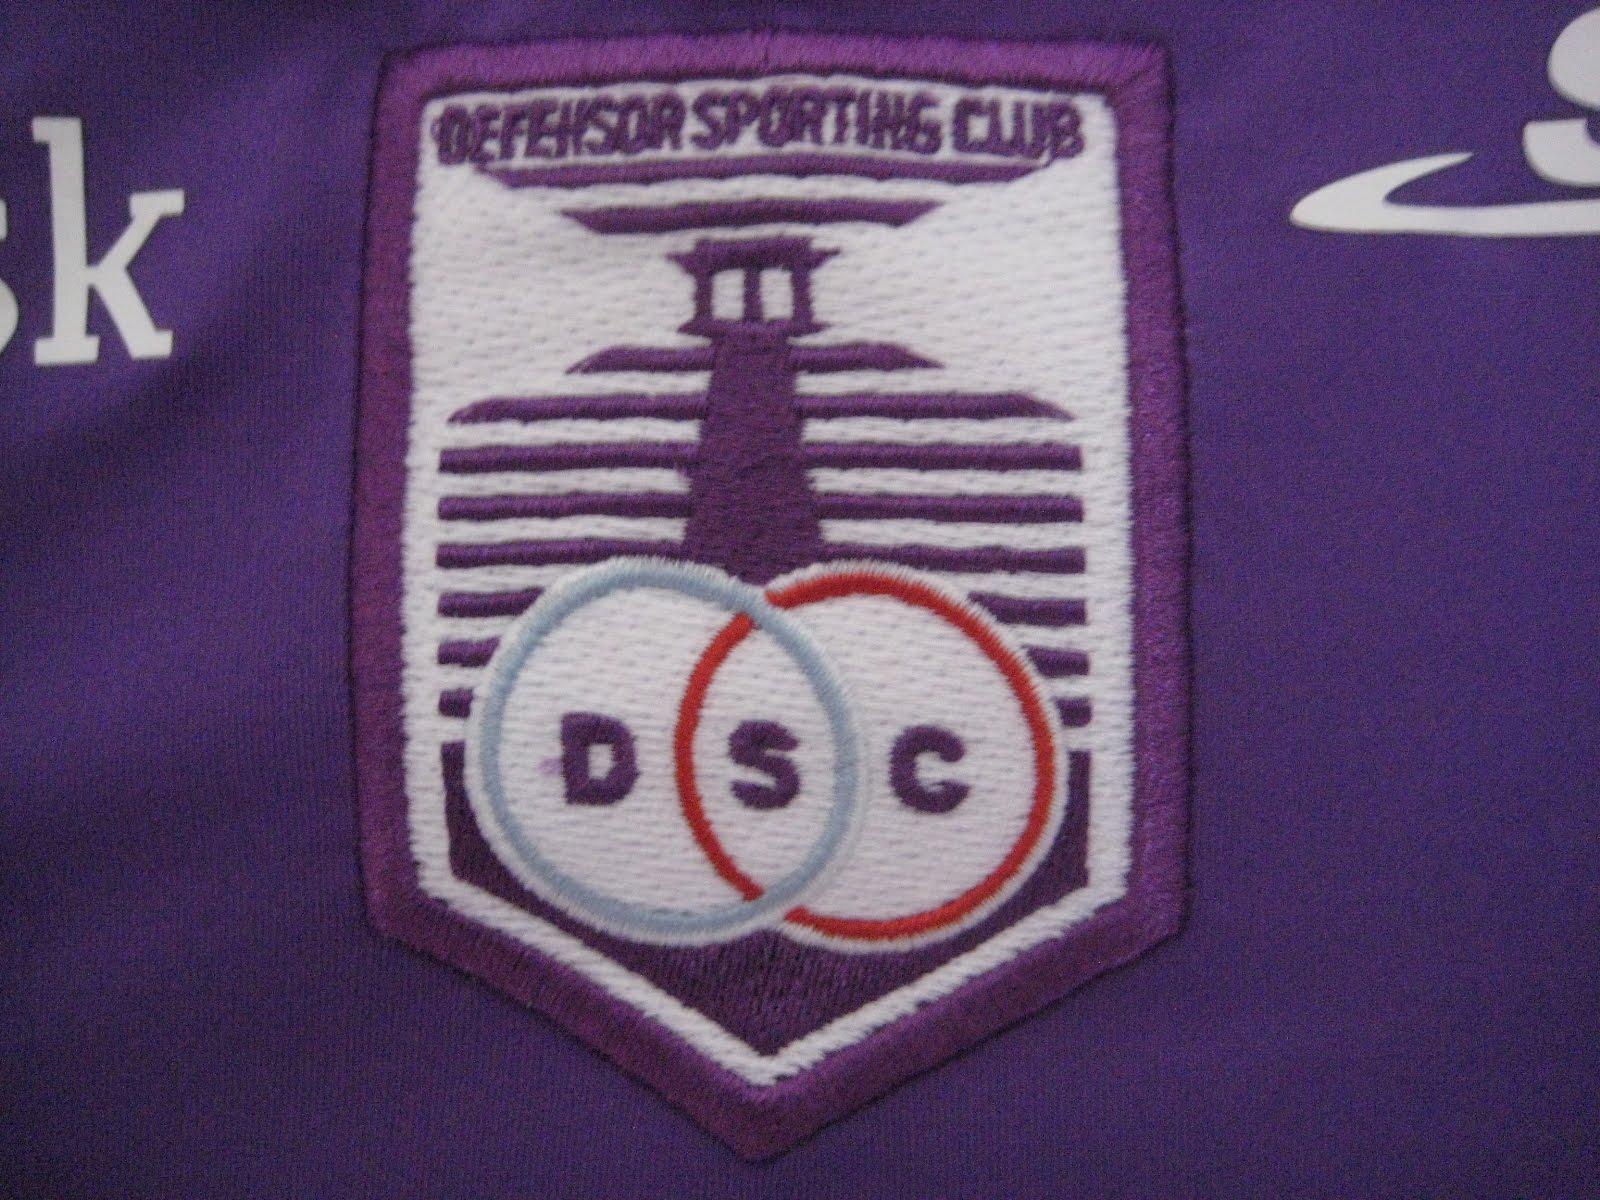 Defensor sporting